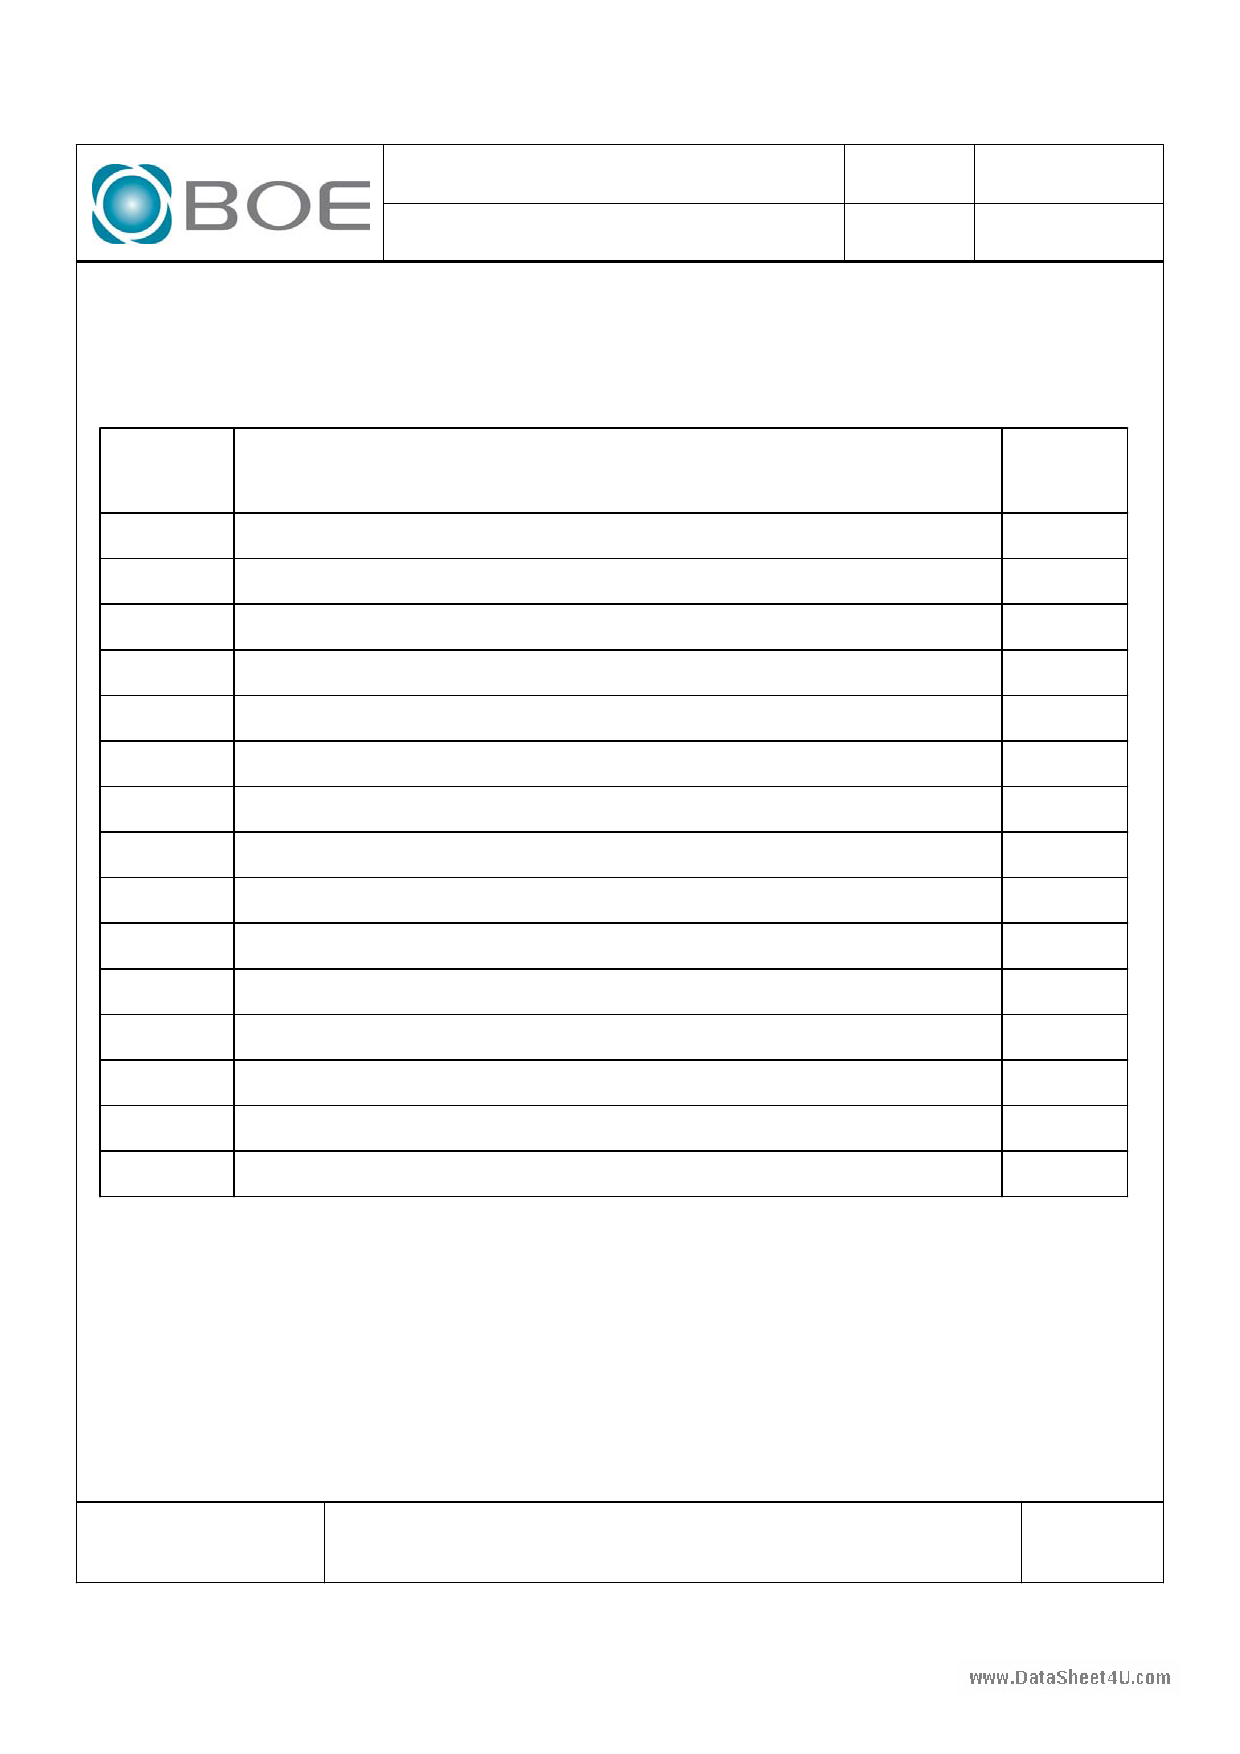 HV150UX1-101 pdf, ピン配列